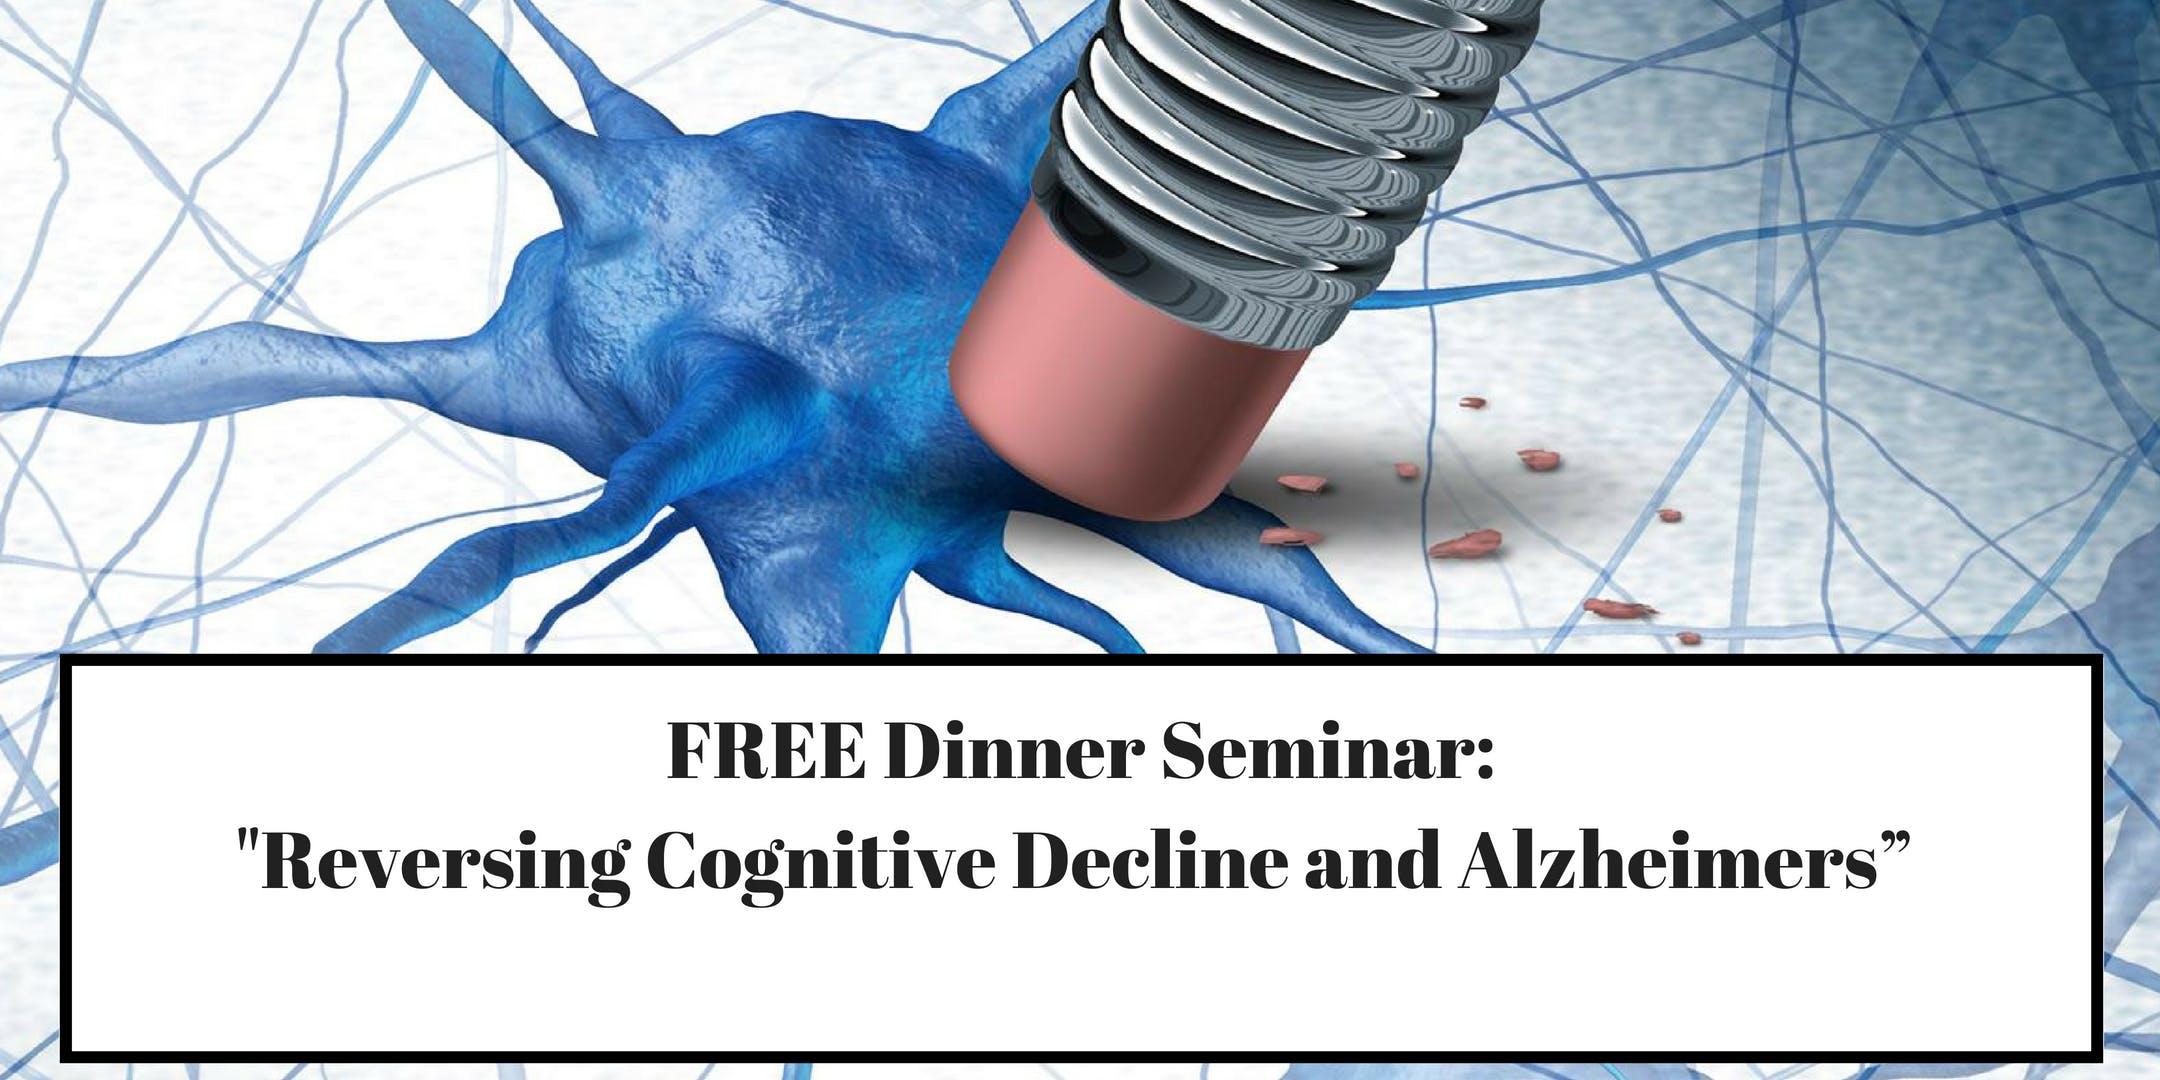 Reversing Cognitive Decline and Alzheimers -